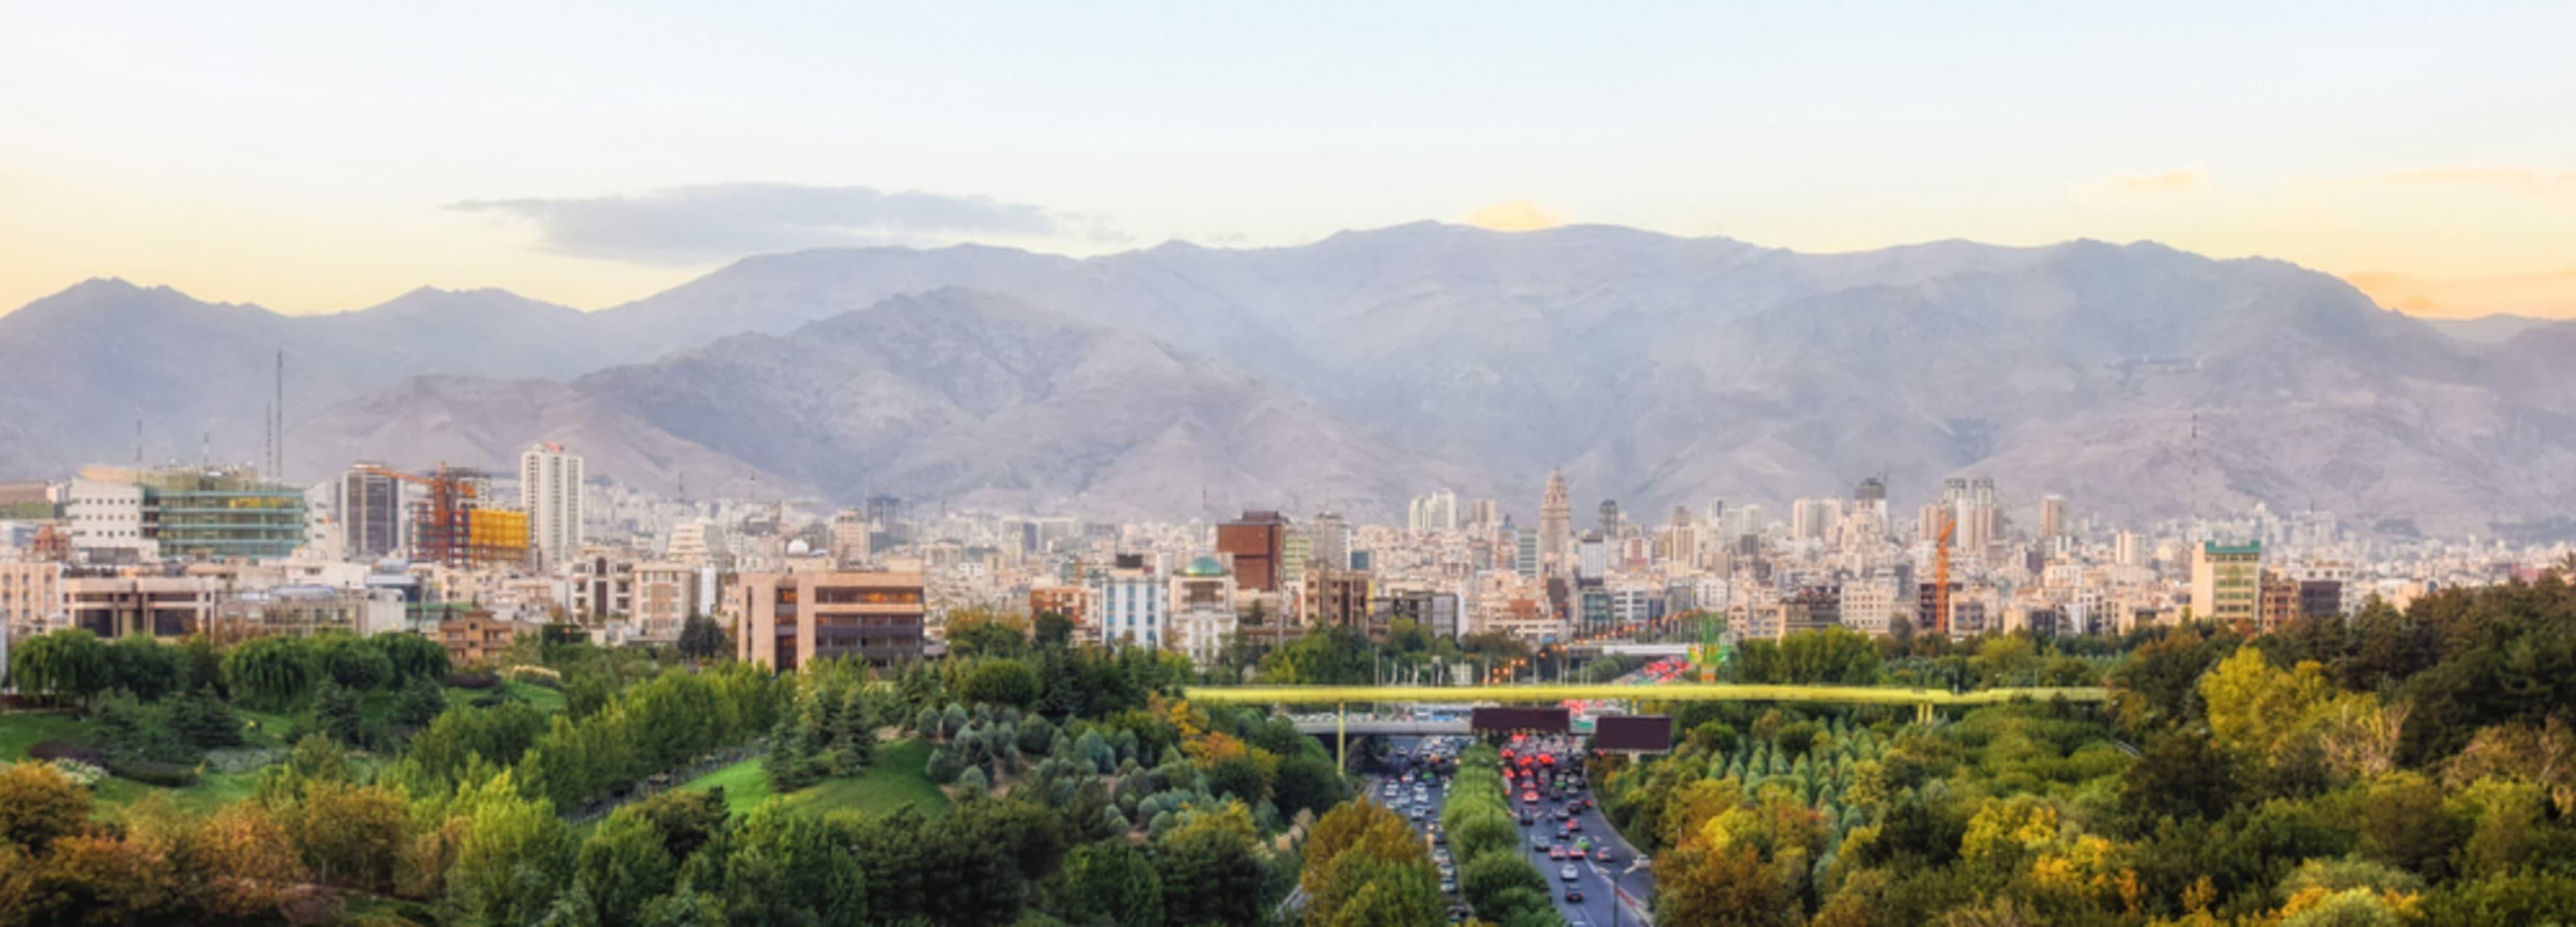 Tehran cover image